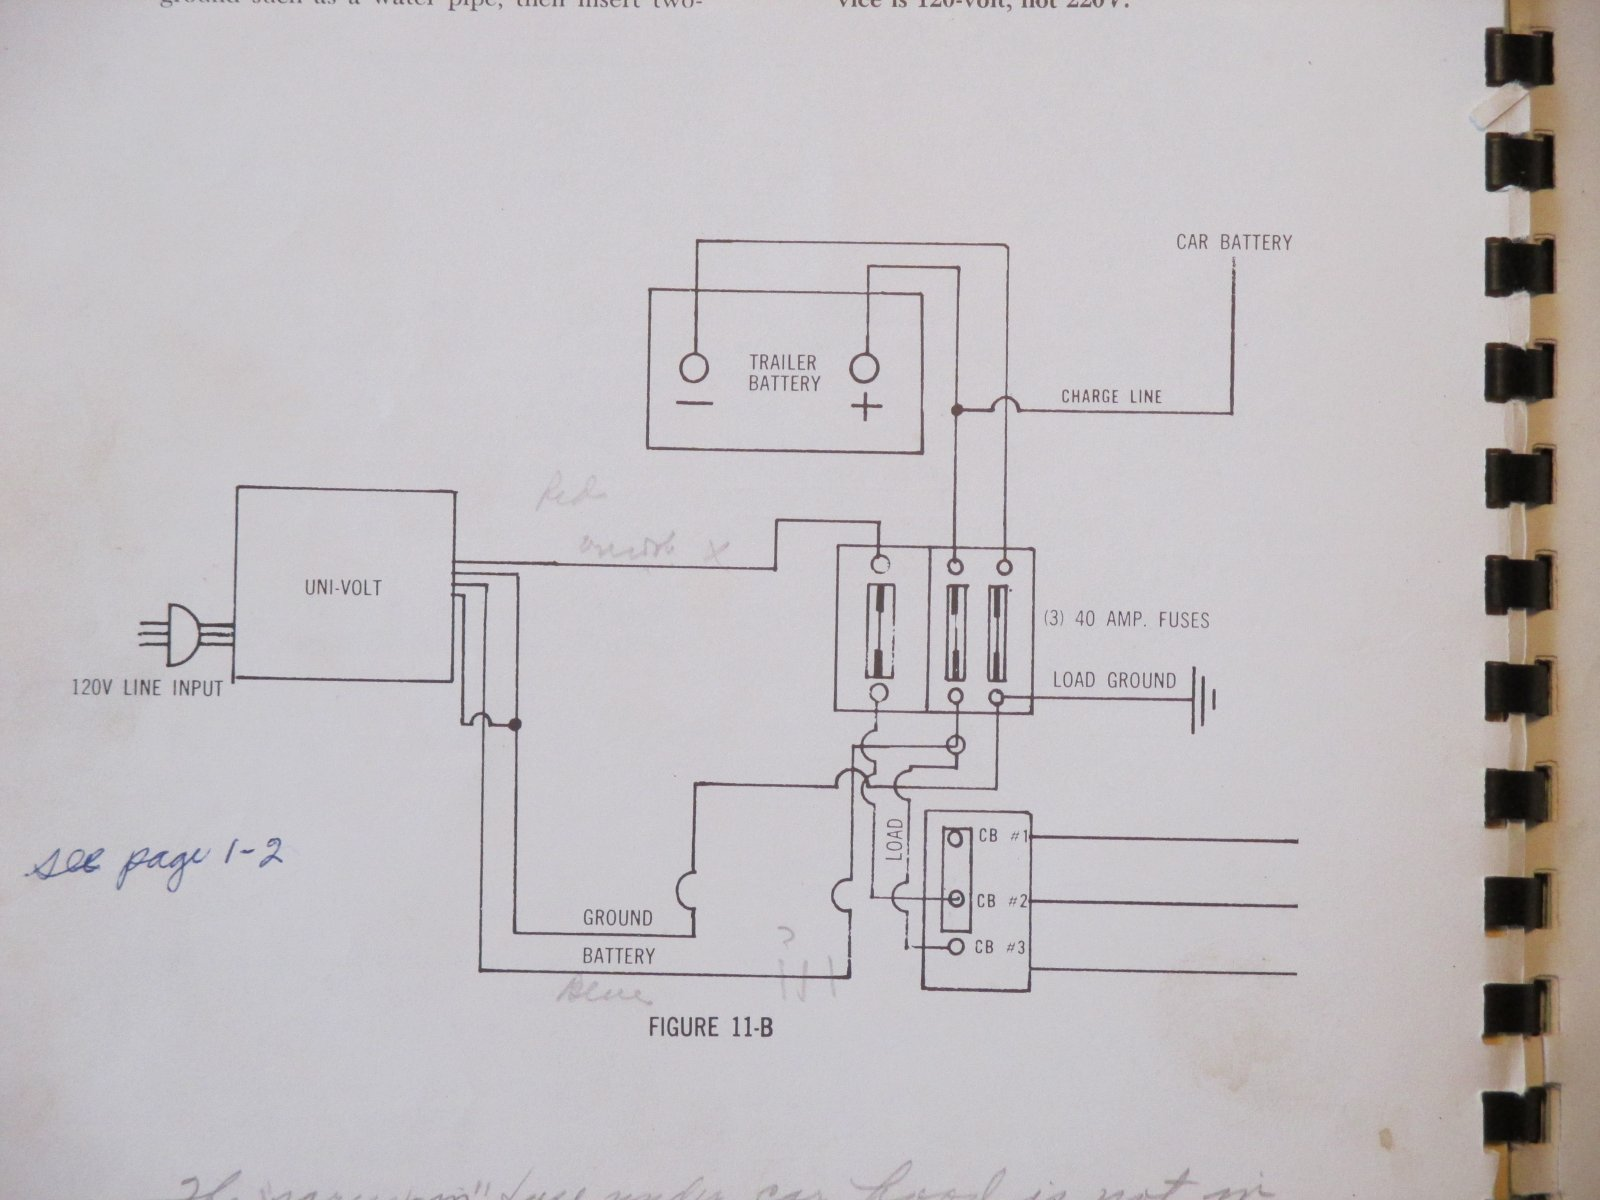 Click image for larger version  Name:1404 Univolt Wiring Diagram.jpg Views:95 Size:180.7 KB ID:224871